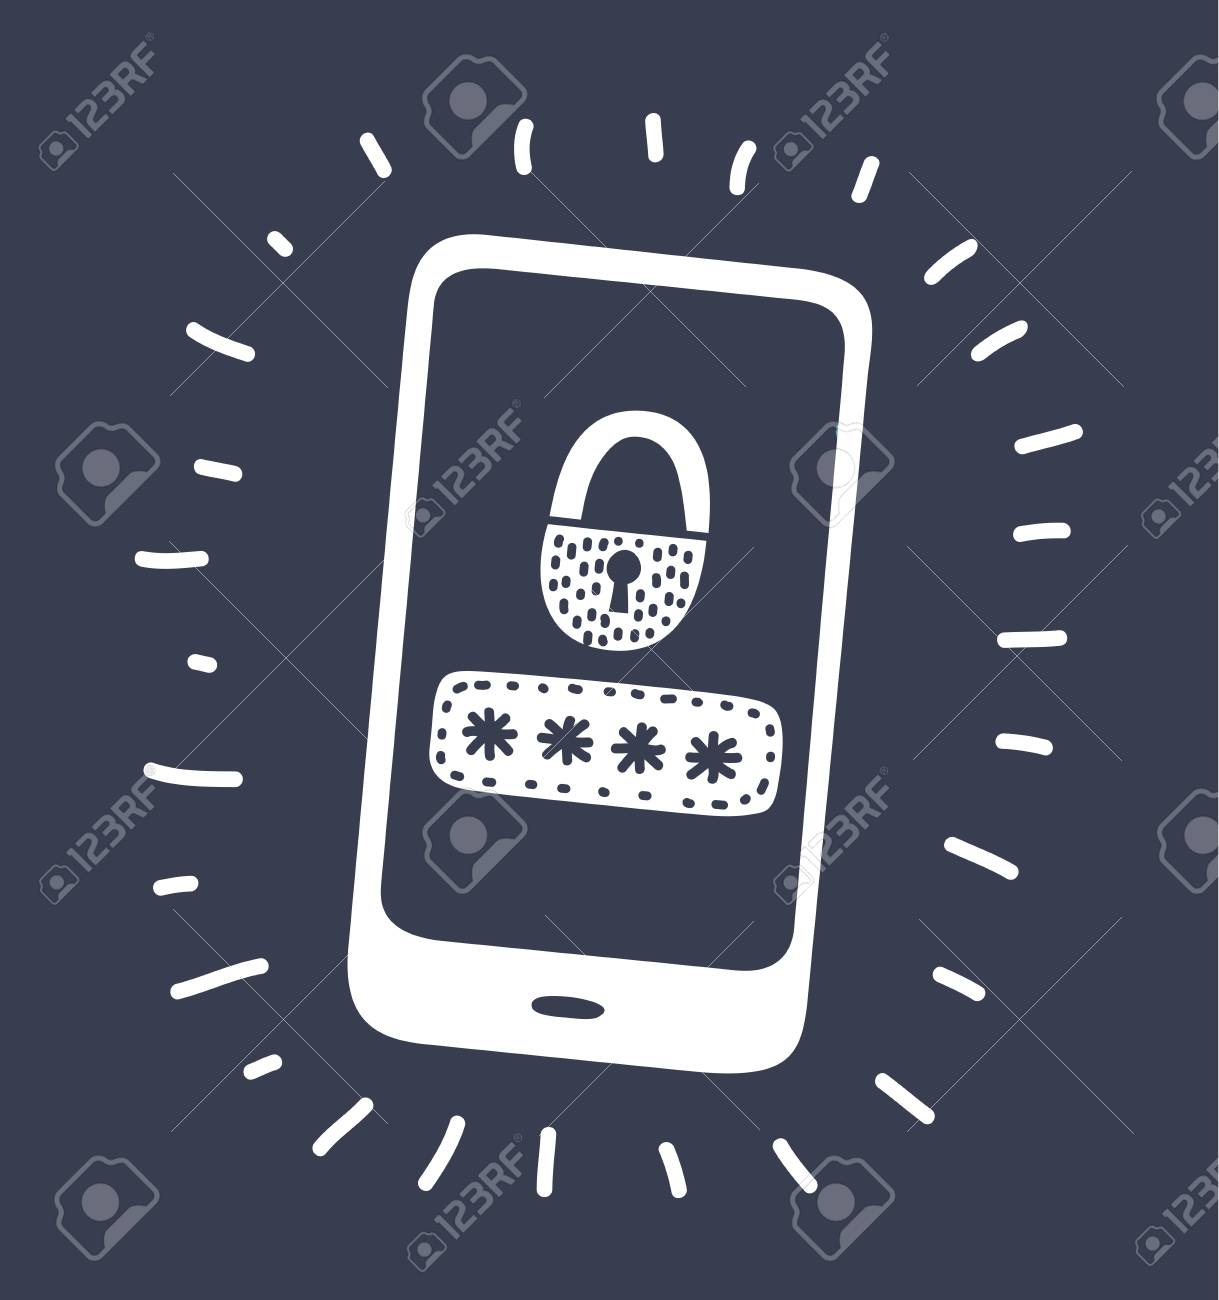 123Rf Password vector cartoon illustration of locked password on display smartphone